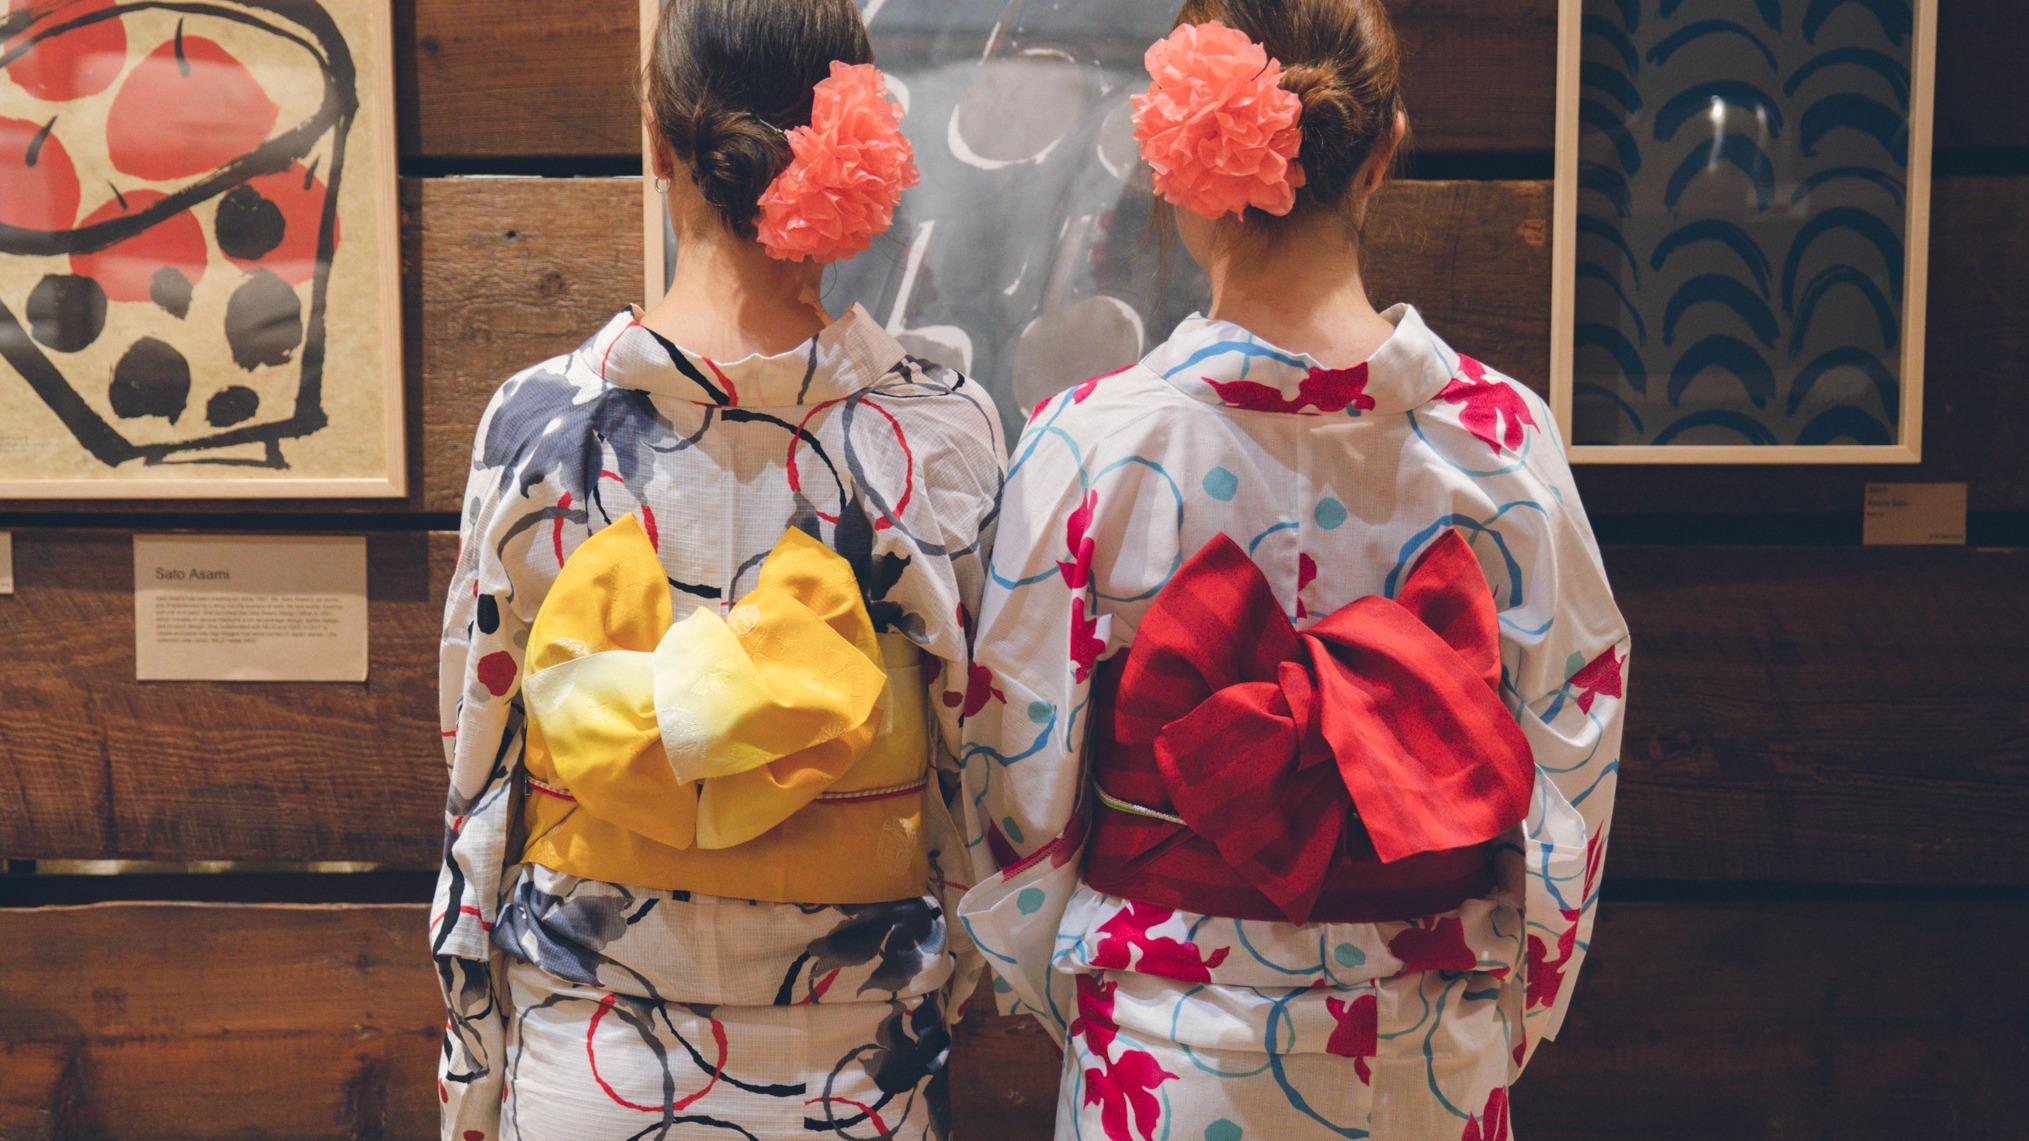 Kimono%20Styling%20by%20Takako%20with%20